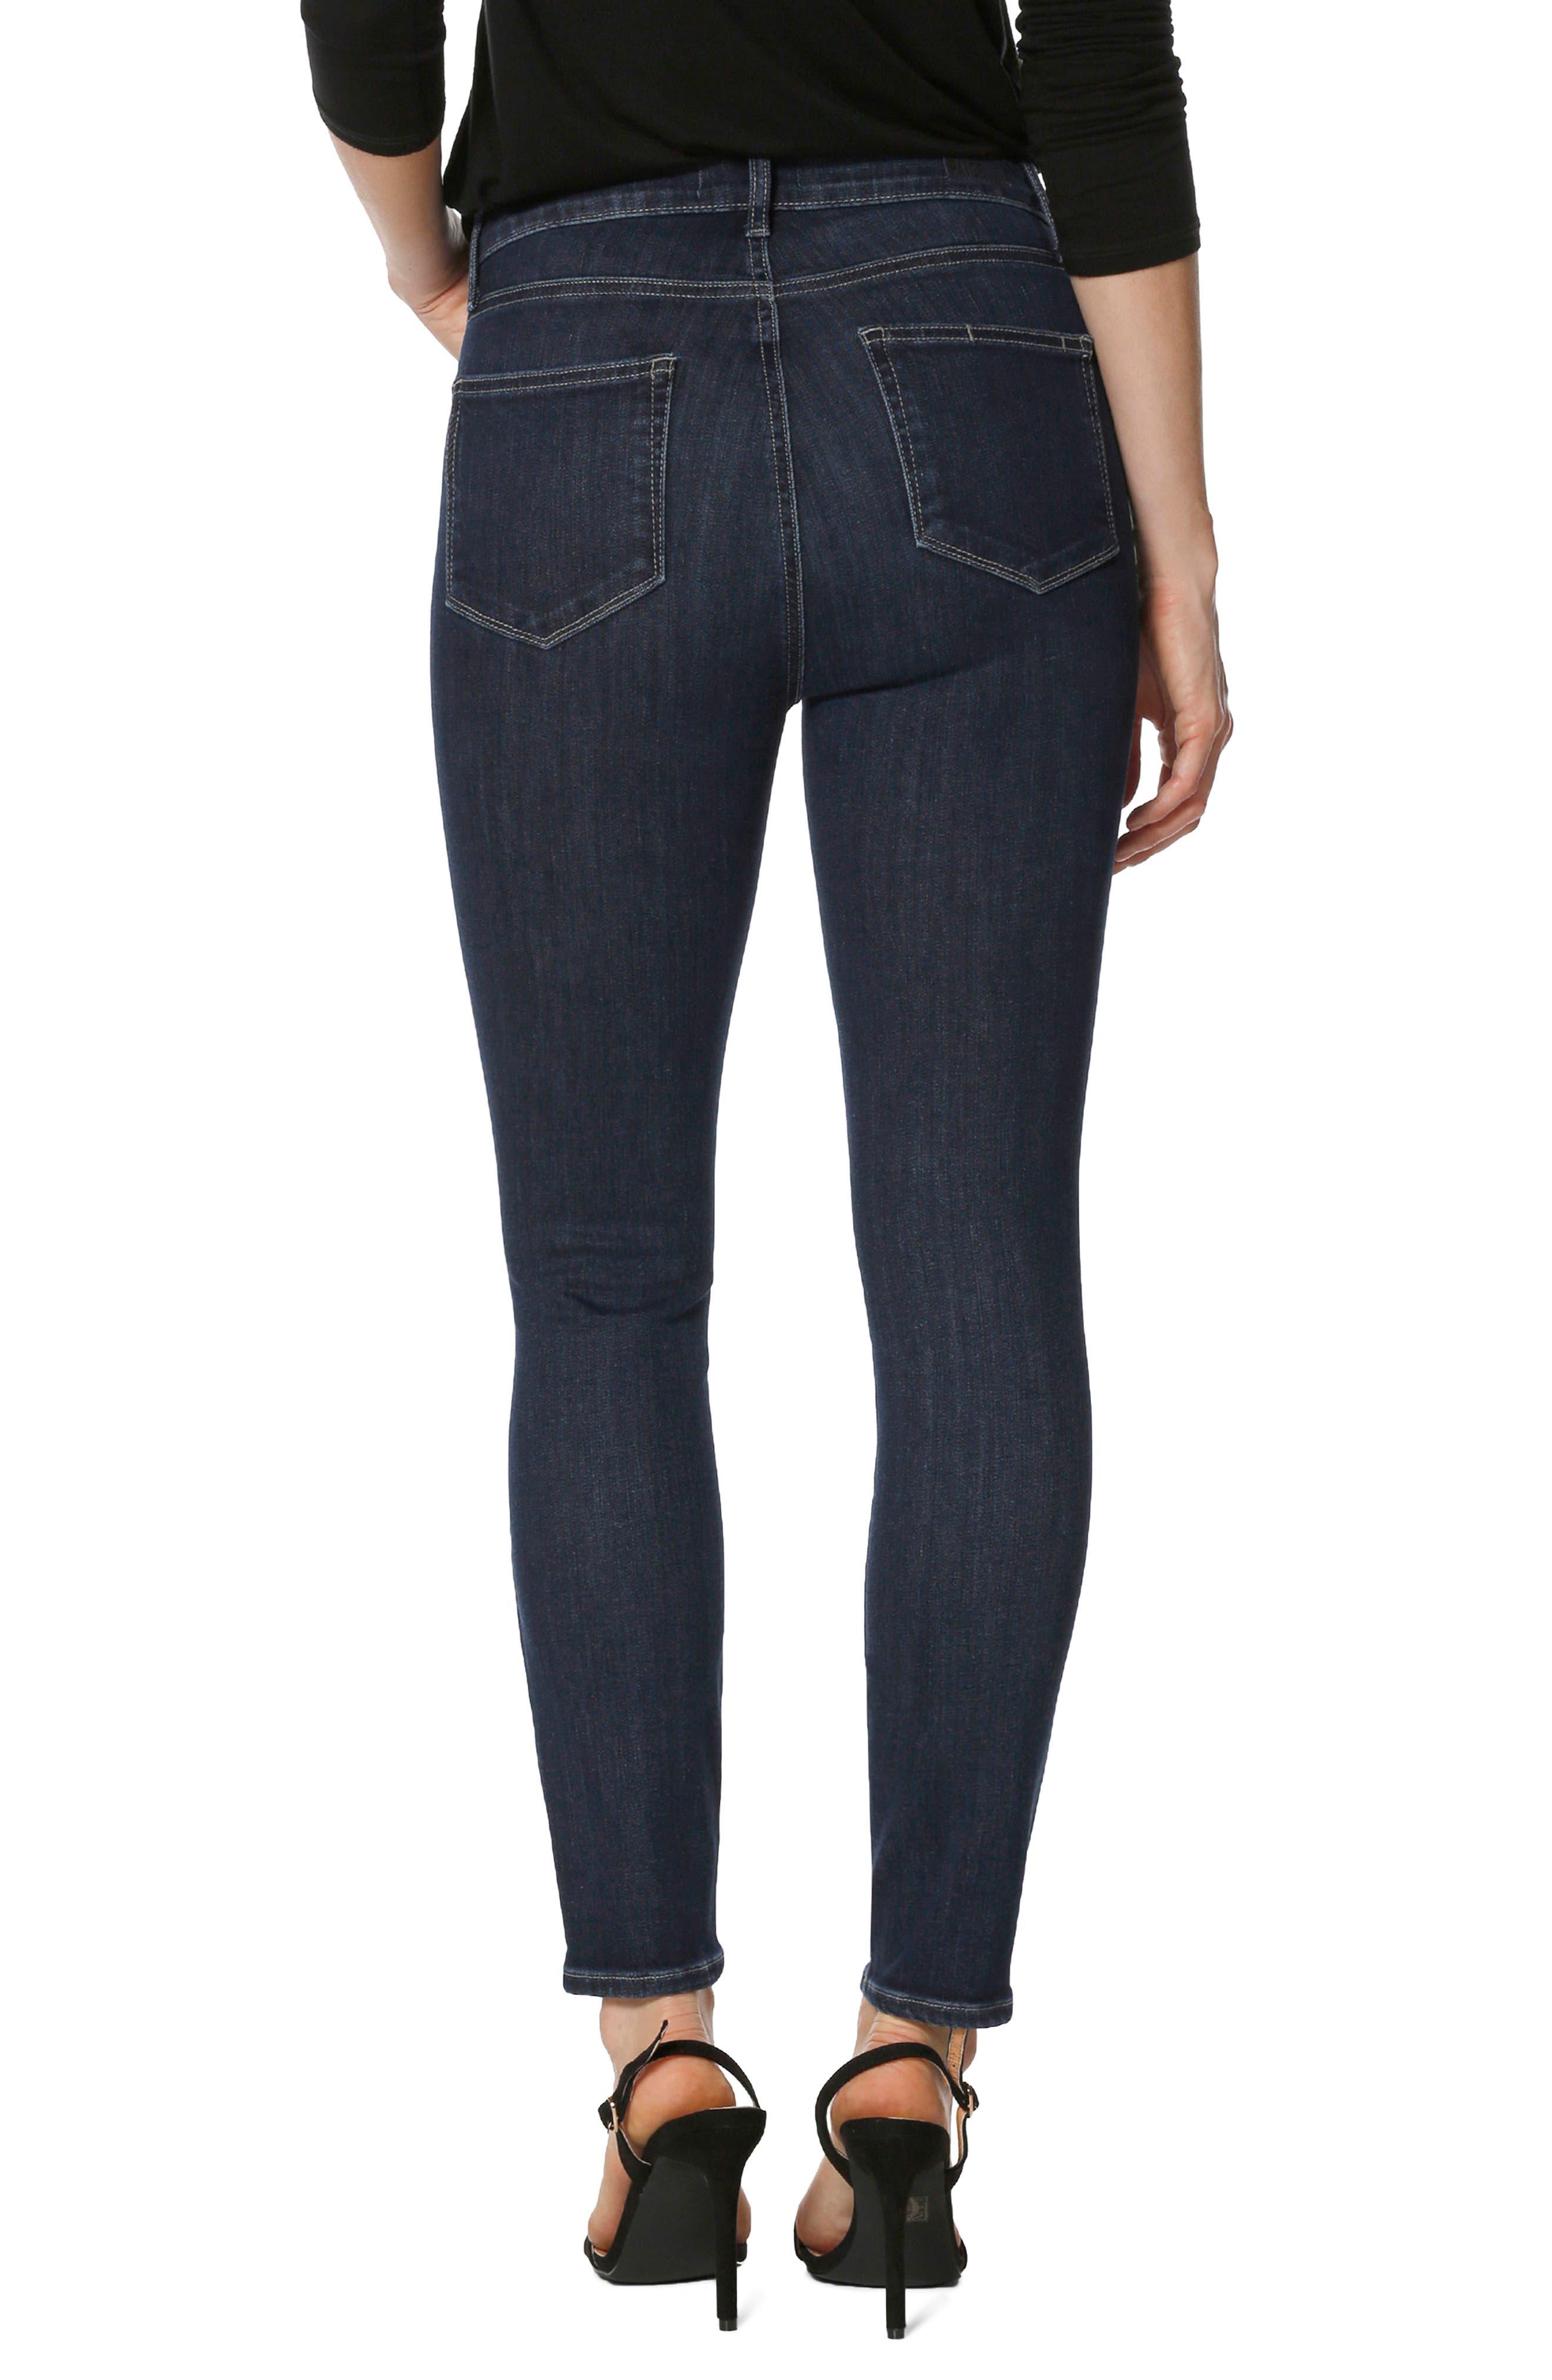 Transcend Vintage - Margot High Waist Ankle Ultra Skinny Jeans,                             Alternate thumbnail 2, color,                             Regal